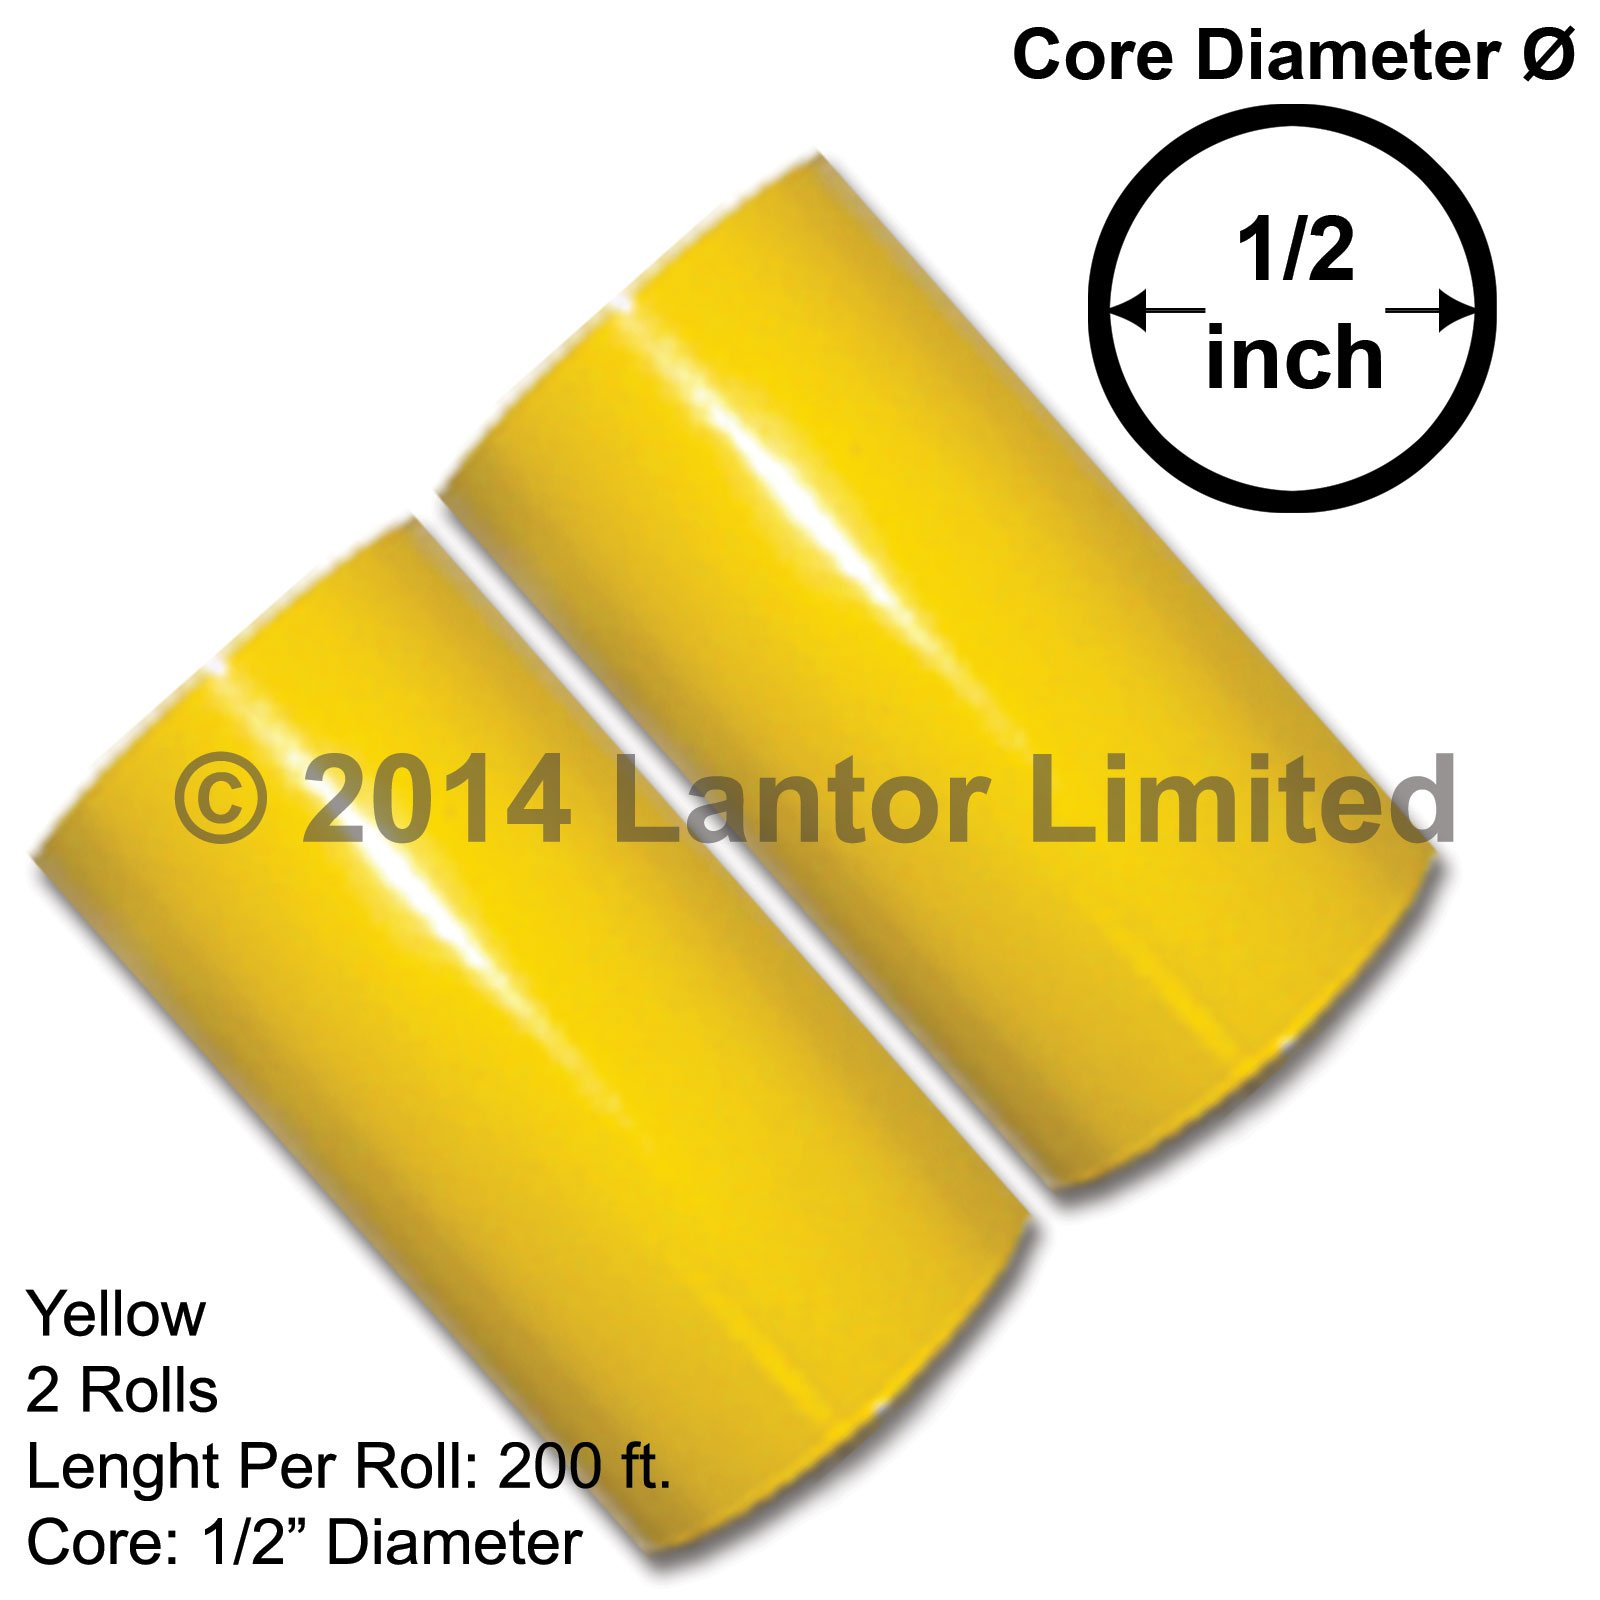 3 in 400 Ft Hot Foil Stamp 2 x 200 Ft Rolls Yellow KINGSLEY HOWARD